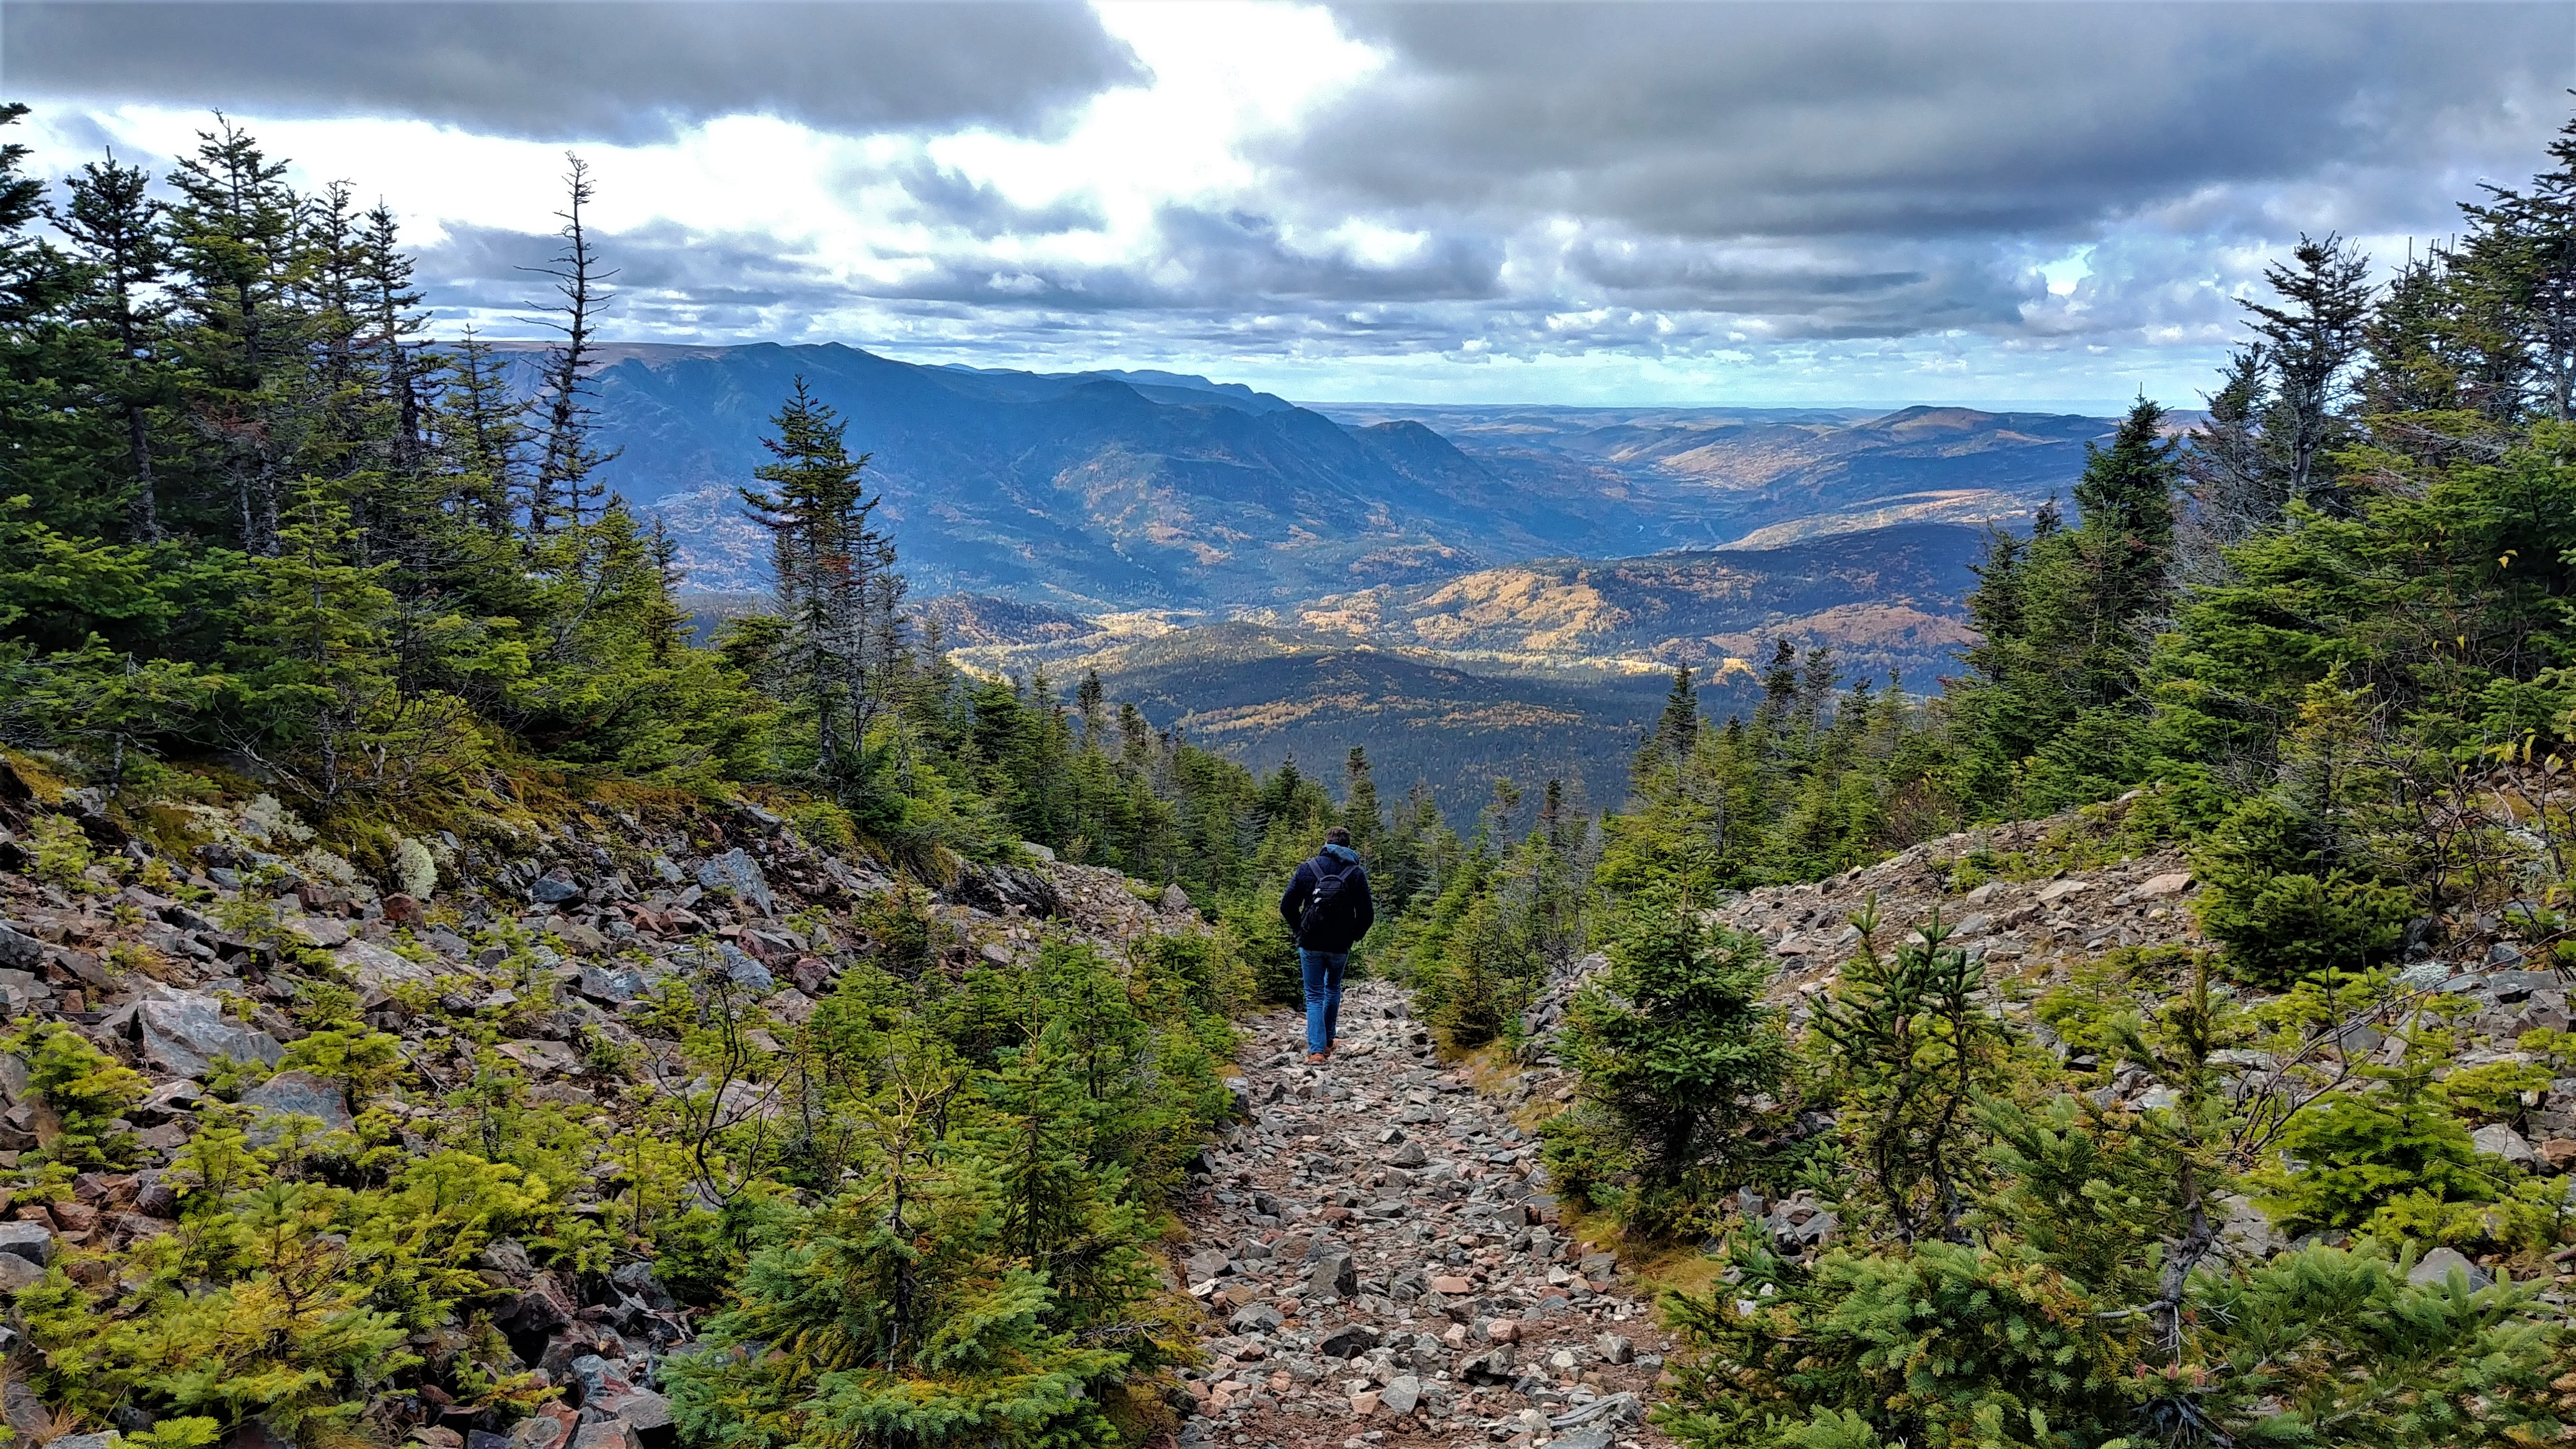 randonnee intermediaire mont joseph fortin parc gaspesie blog voyage quebec arpenter le chemin